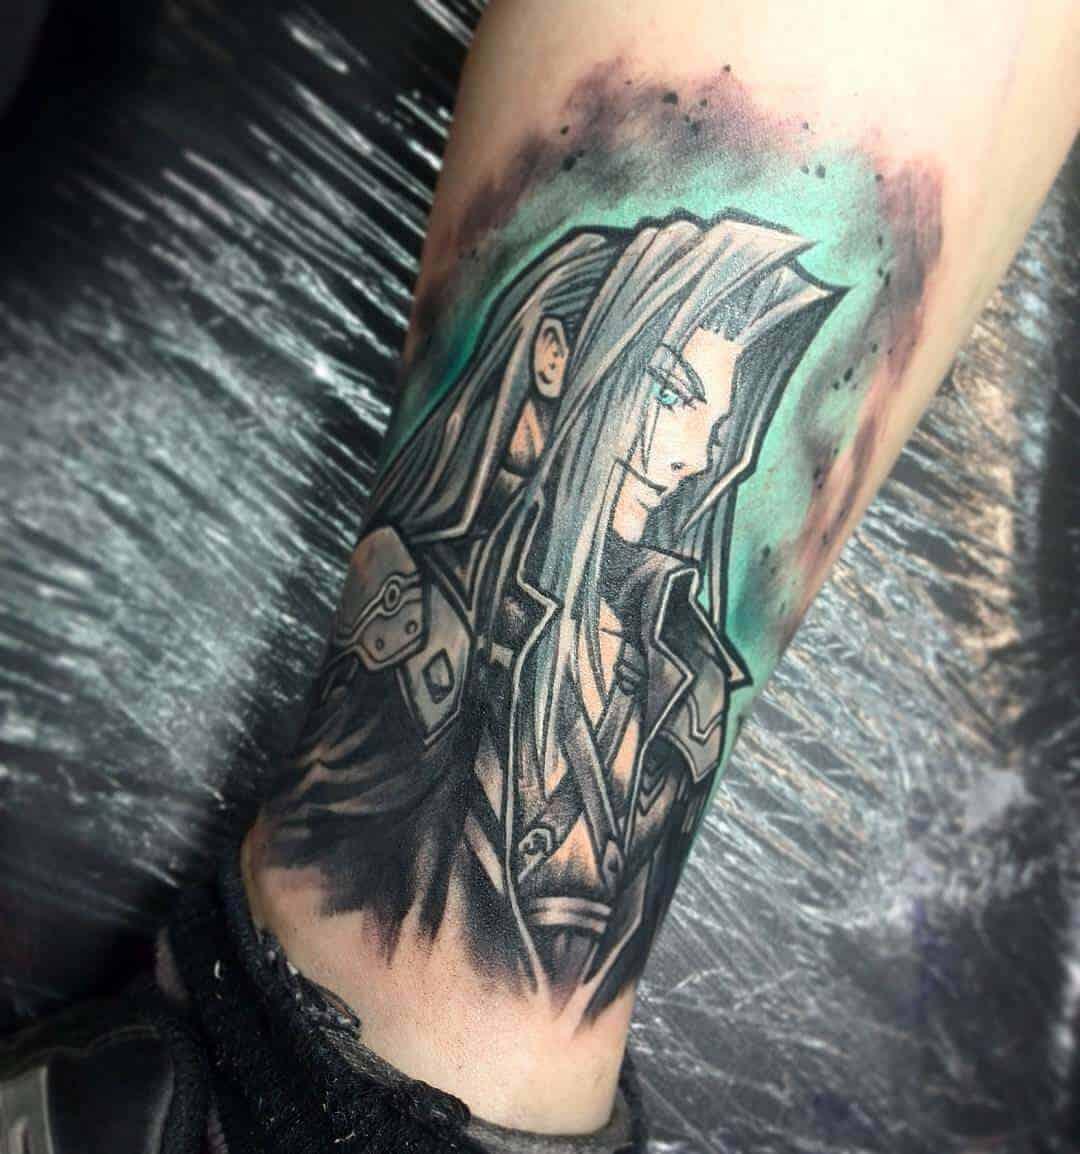 sephiroth tattoo on leg